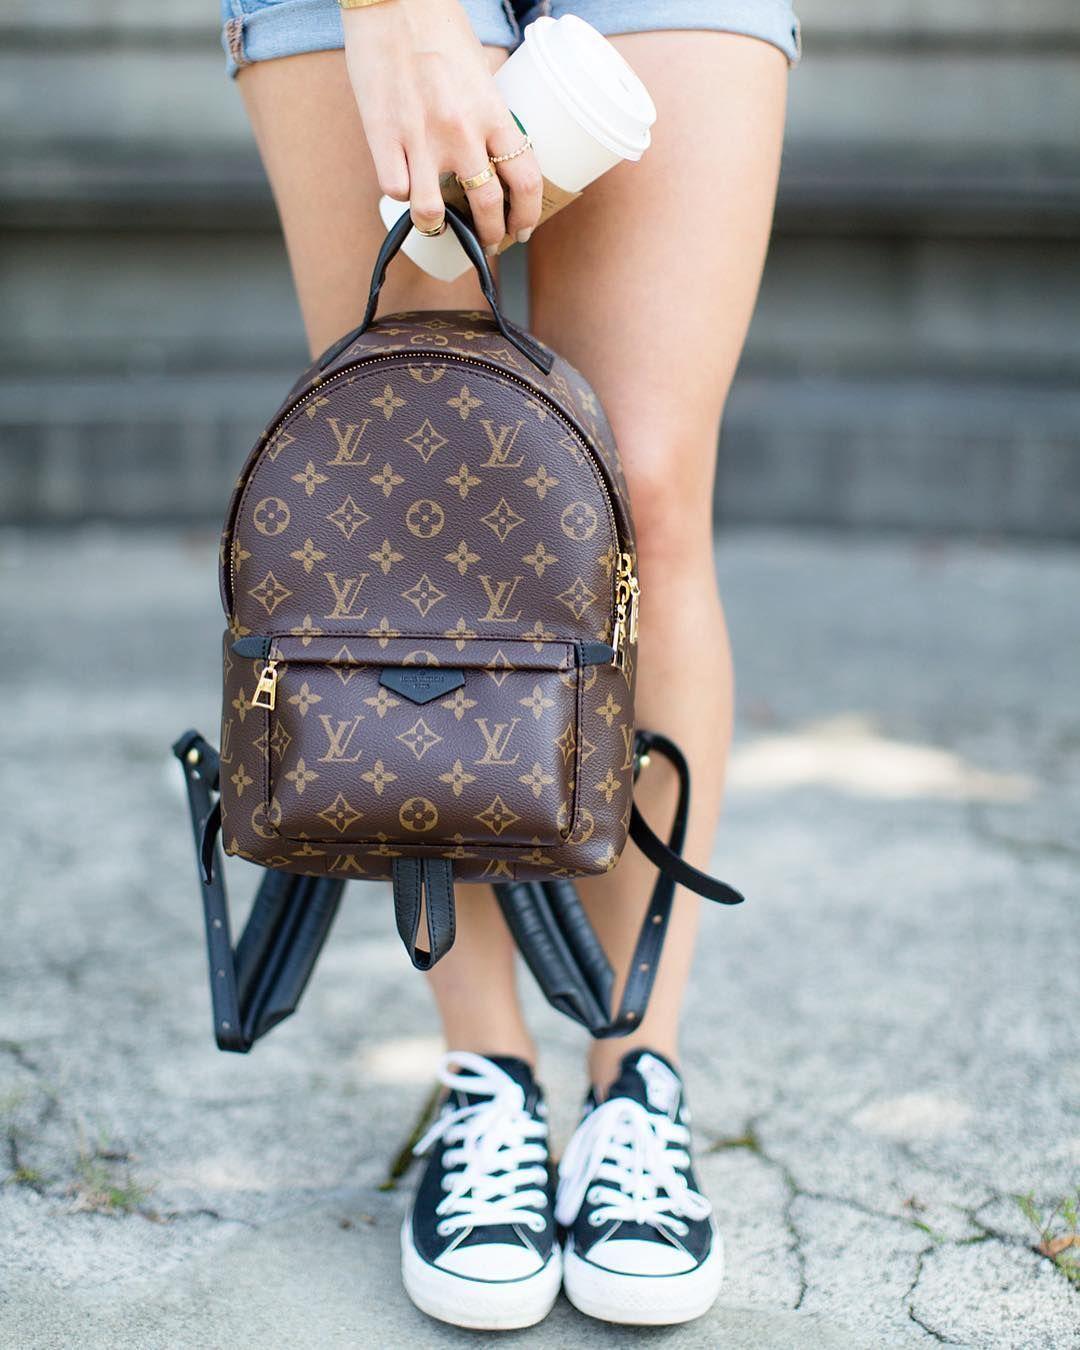 40e2e334de All eyes on 2017 Louis Vuitton palm spring PM backpack ...